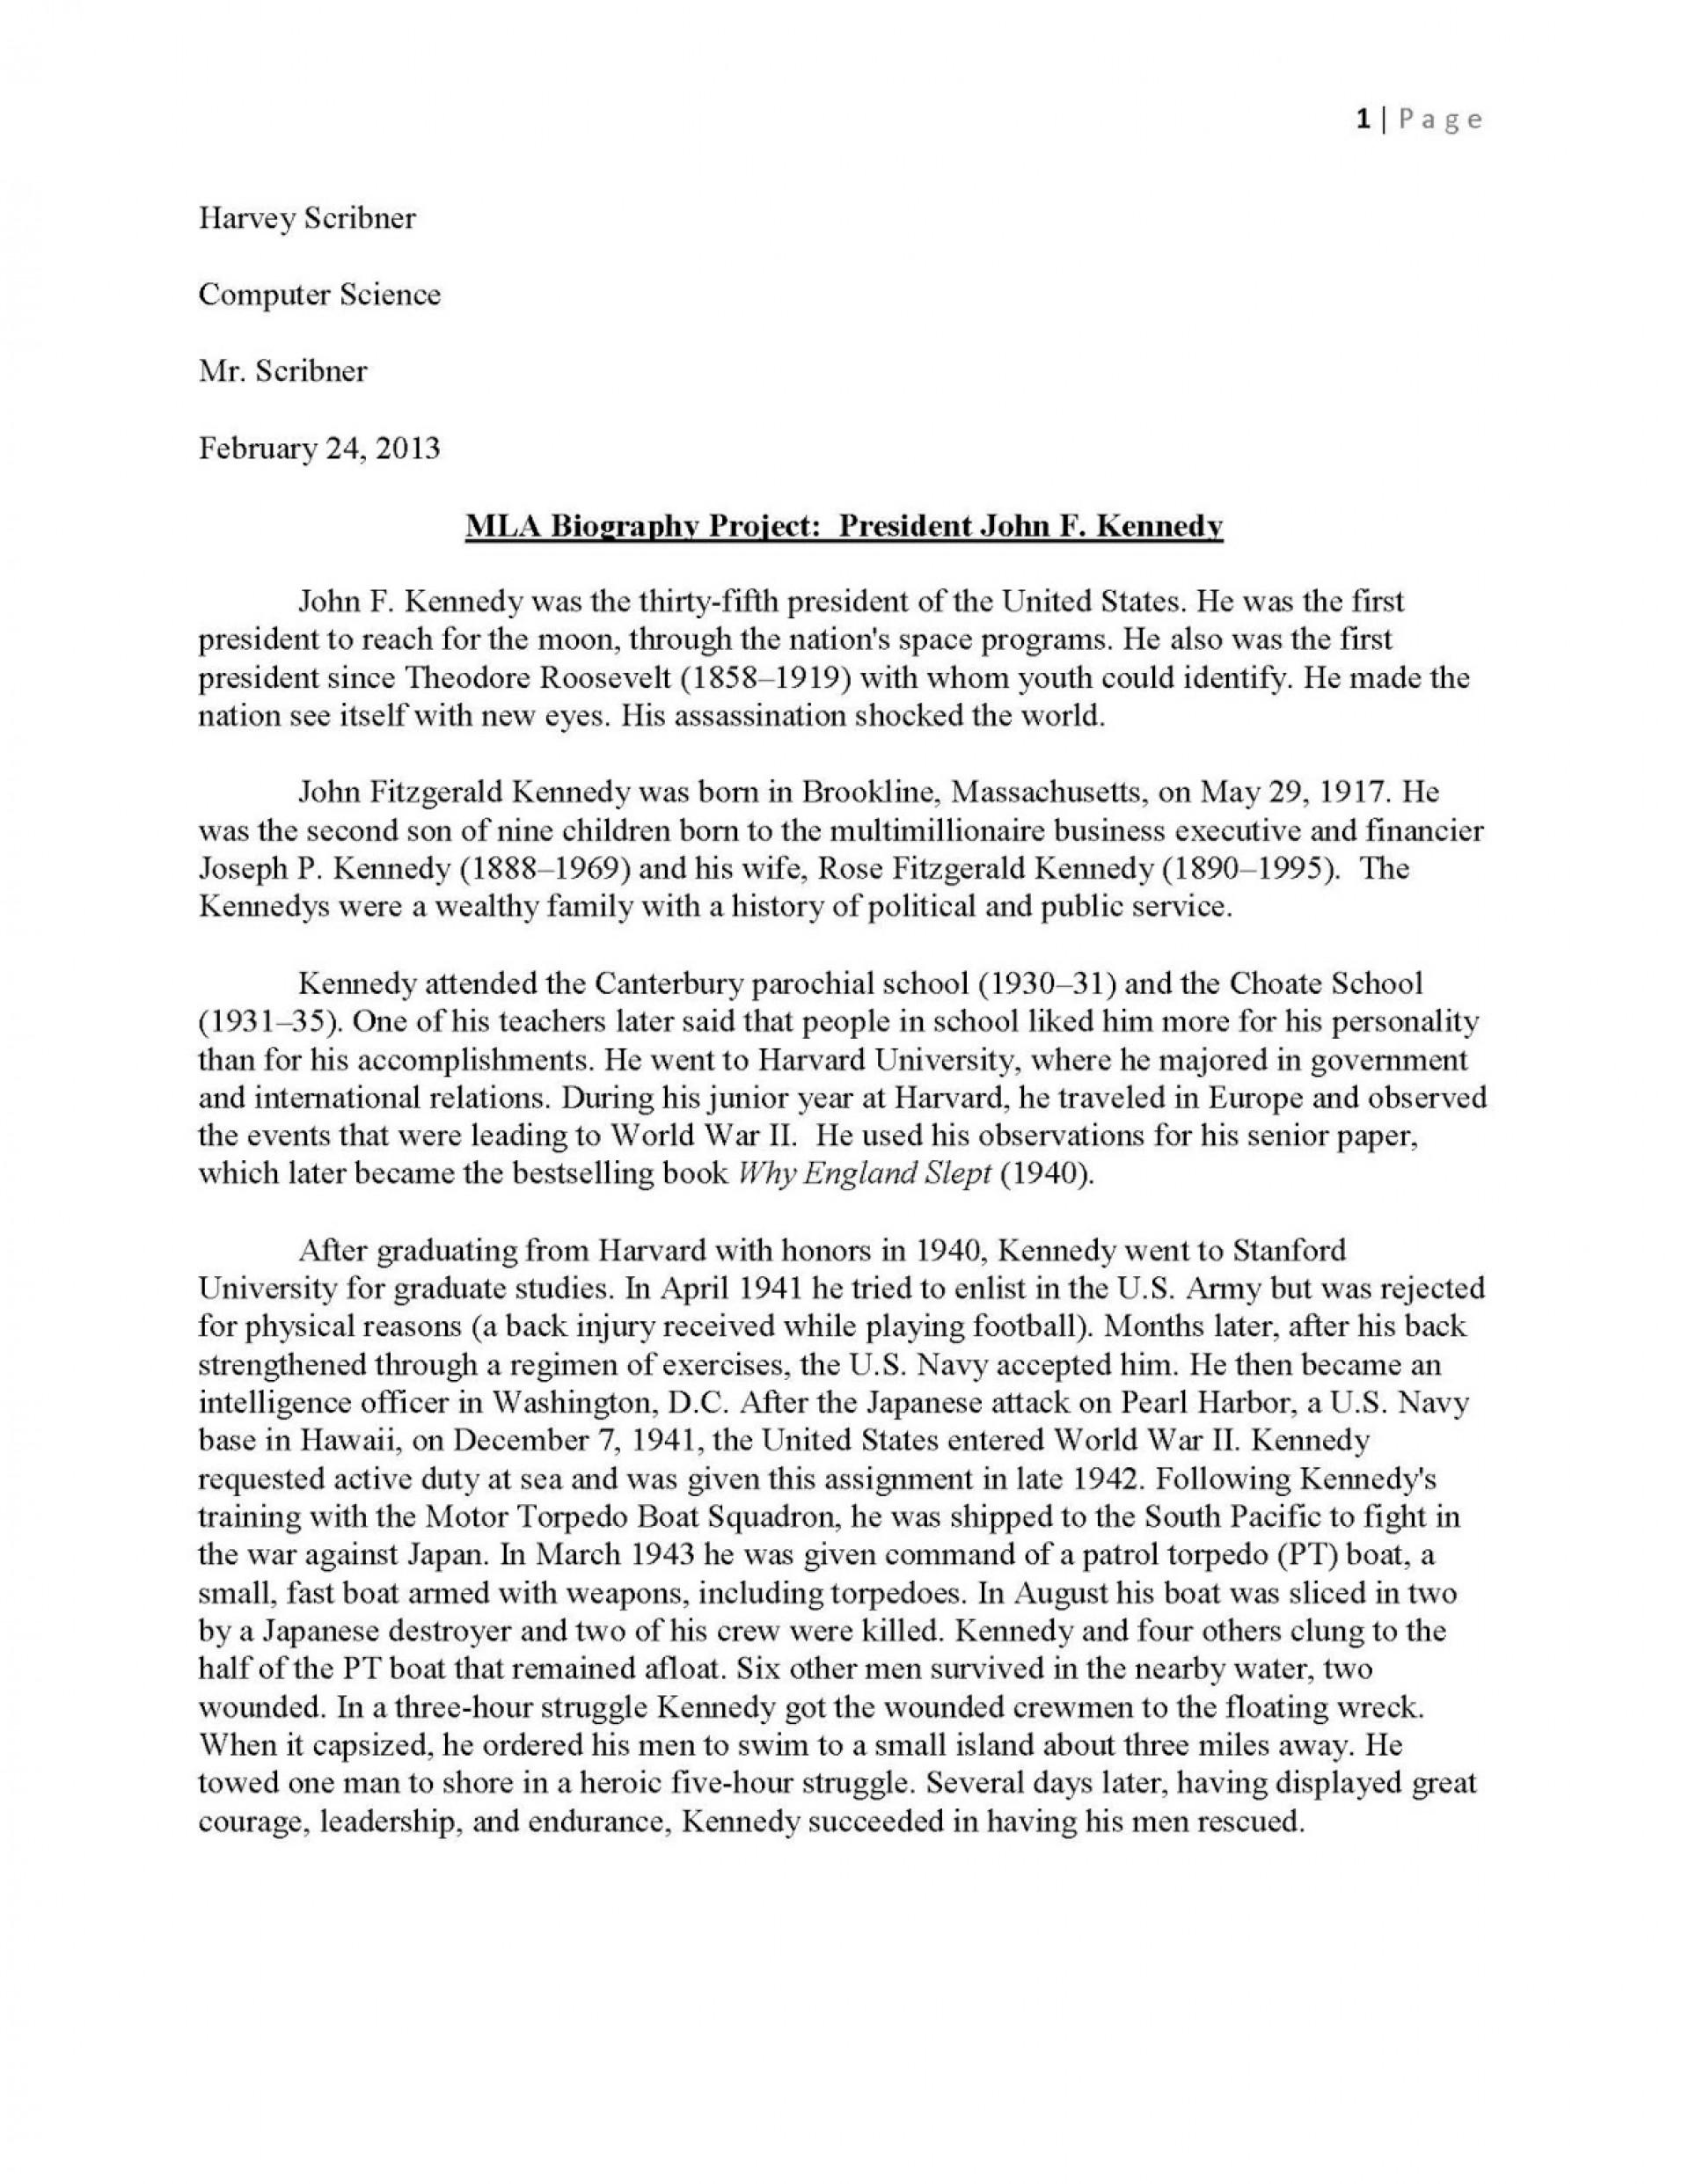 016 Jfkmlashortformbiographyreportexample Page 1 Sample Biography Essay Unforgettable About Myself Elementary Self 1920